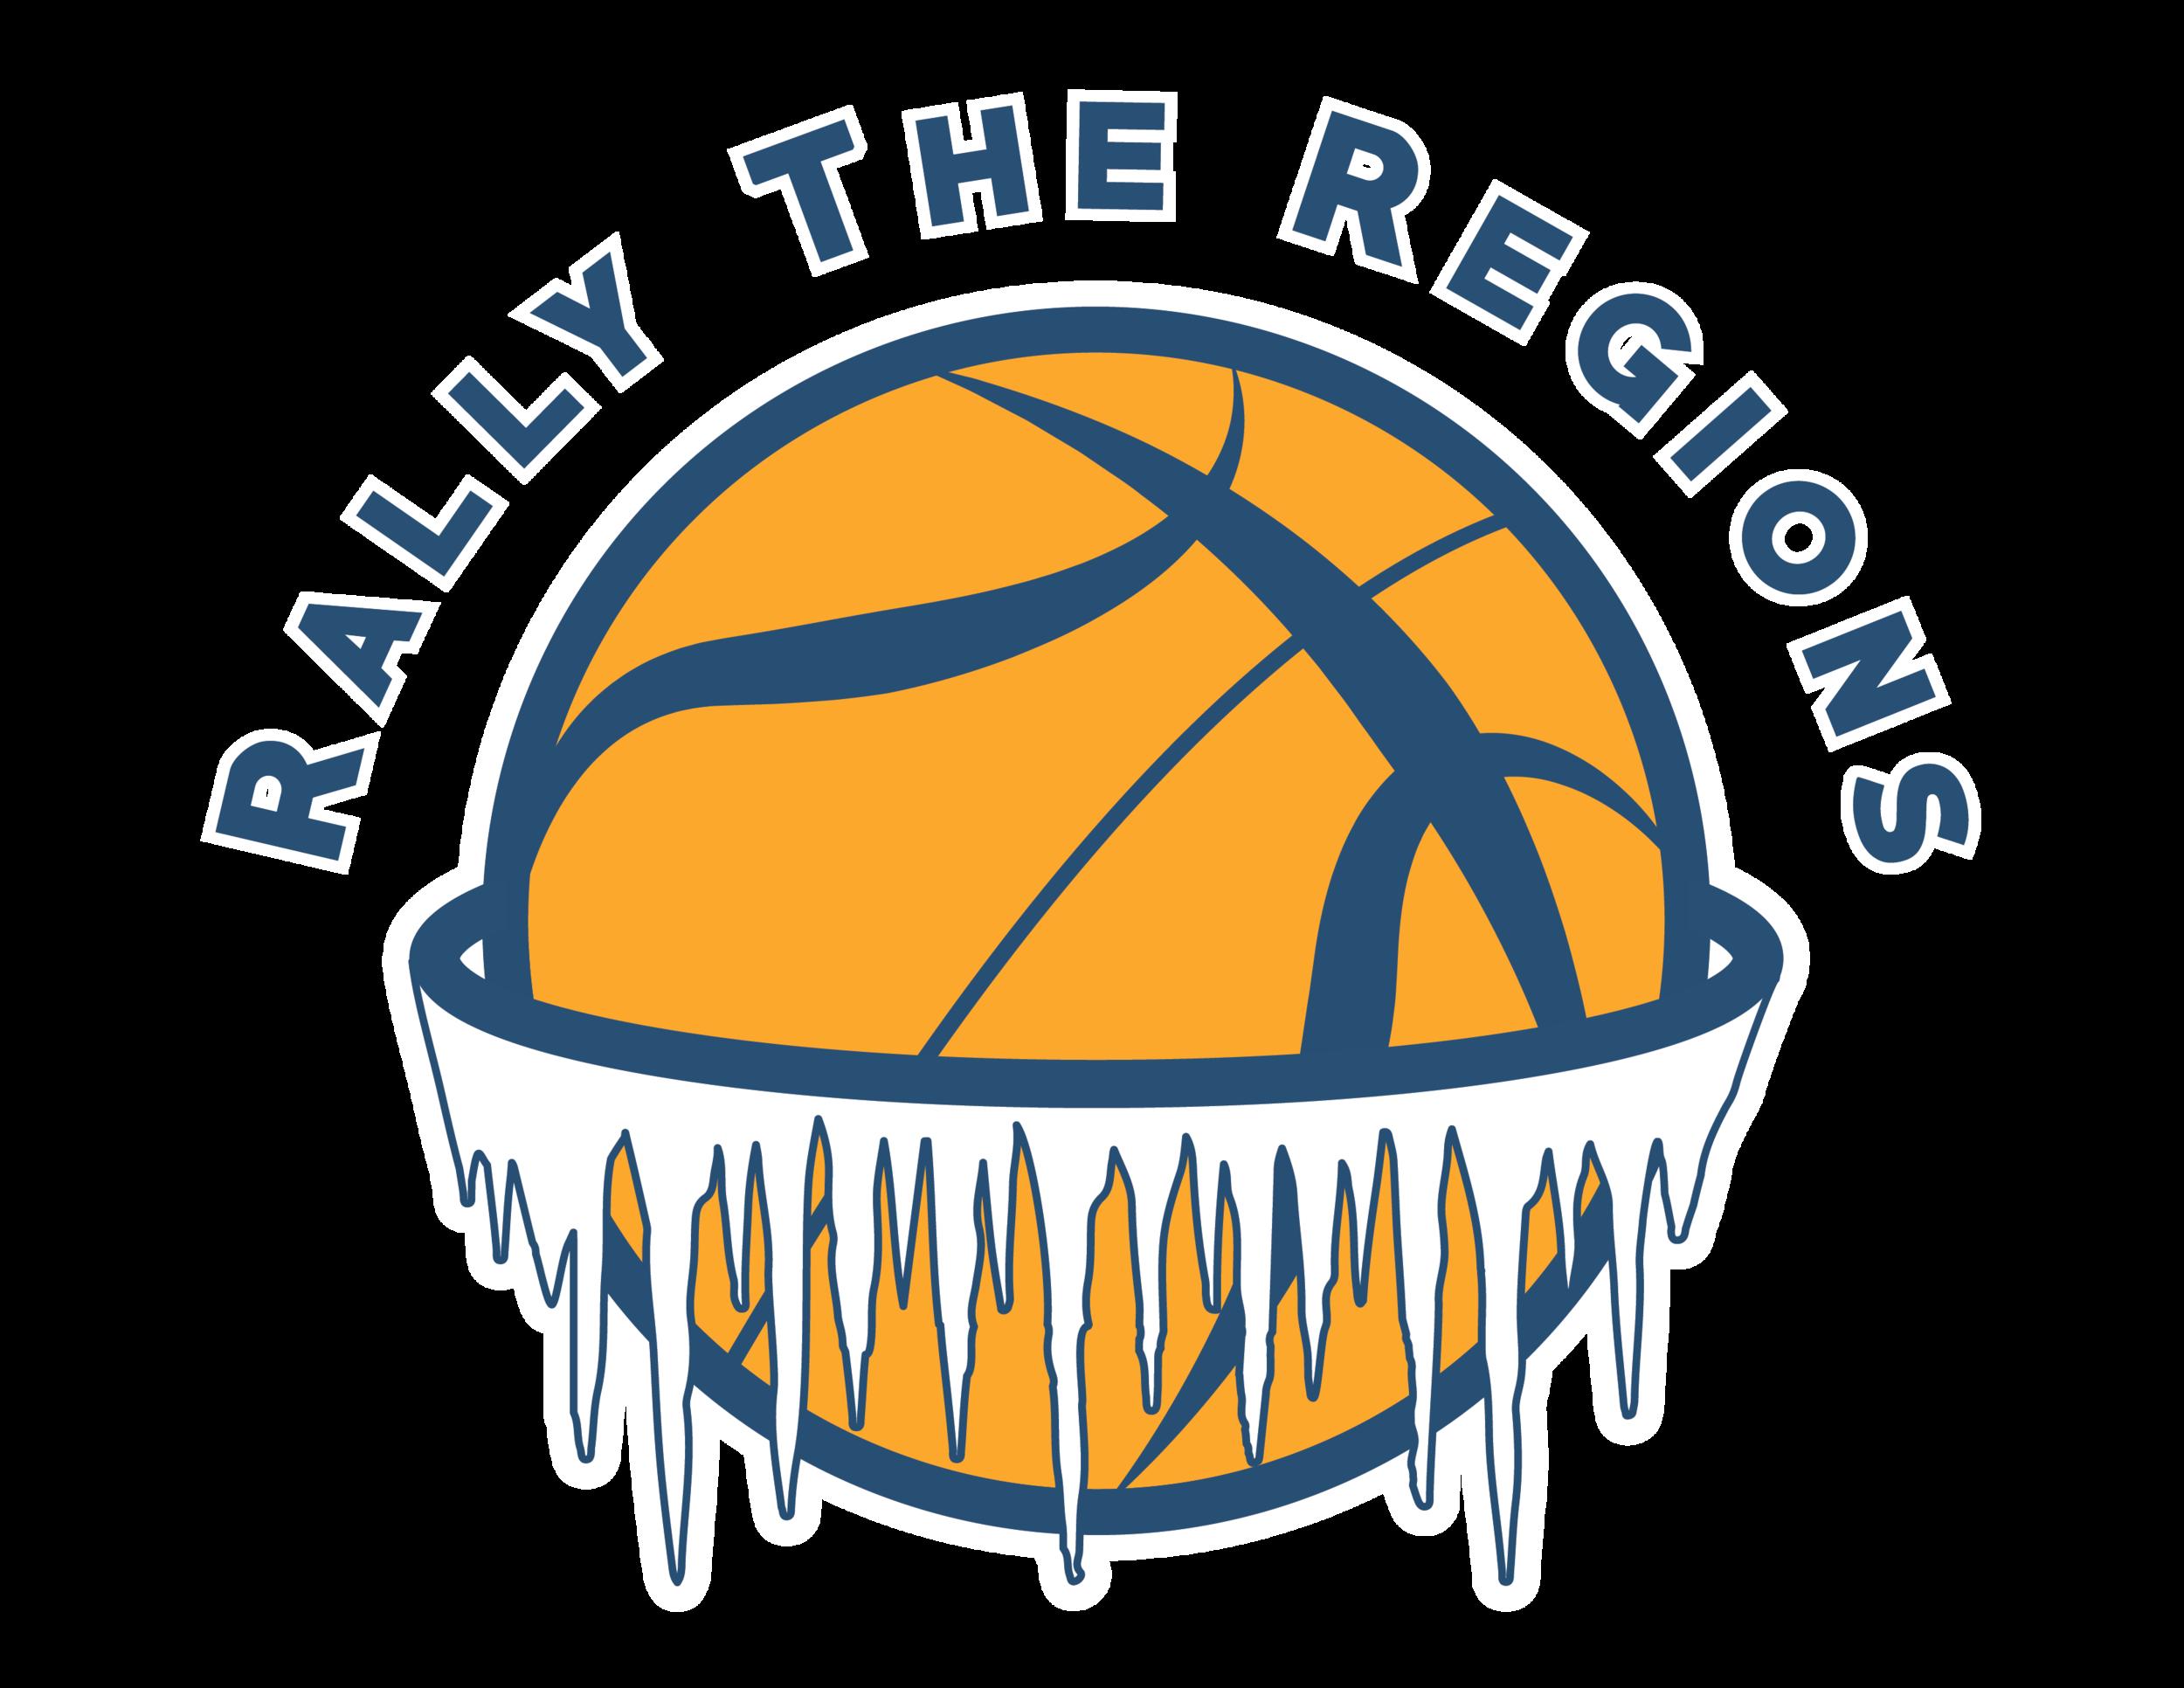 Rally the Regions Hardwood Classic